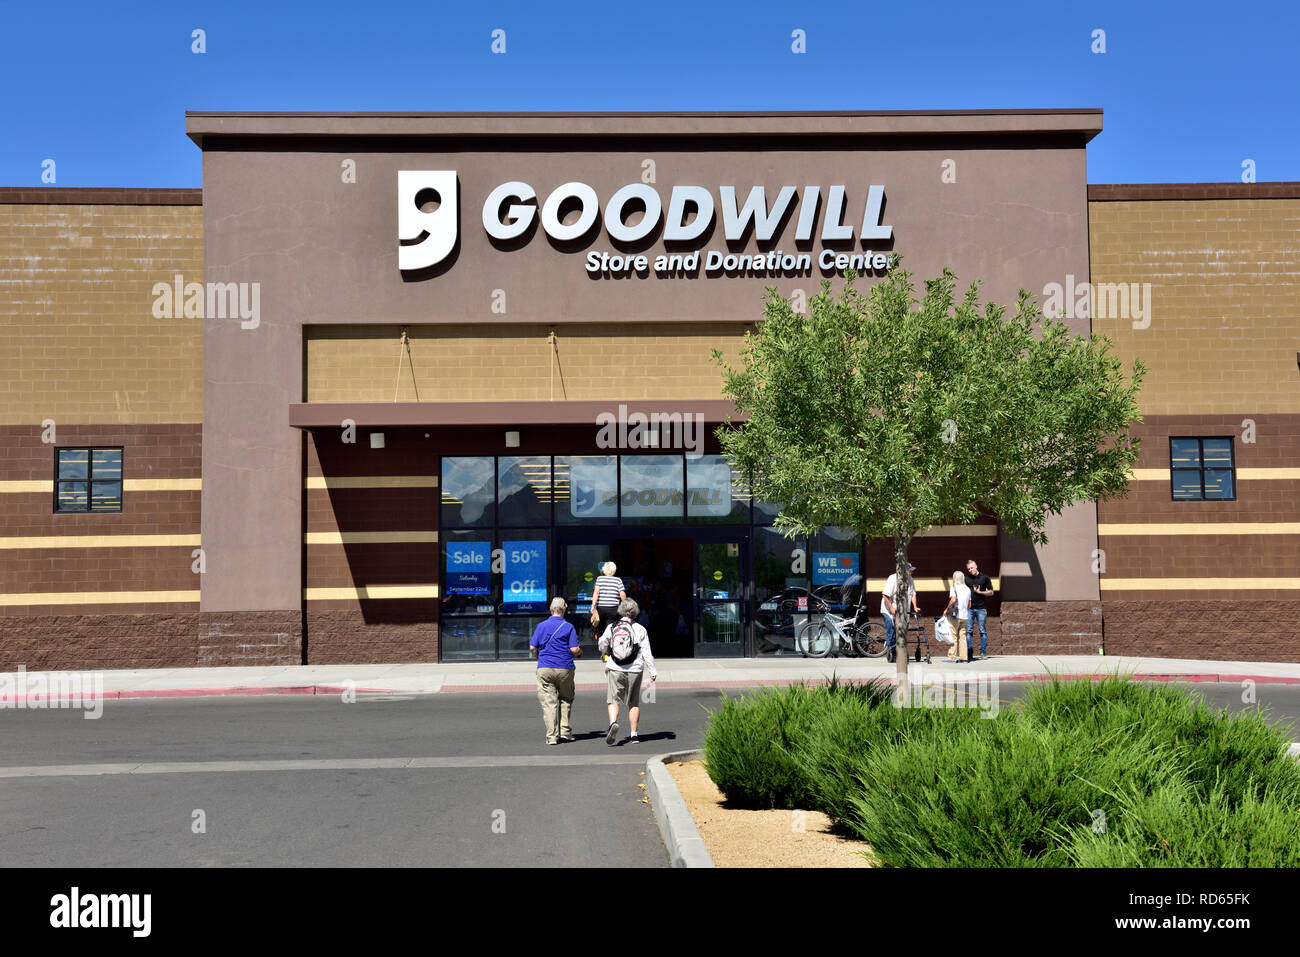 Outside Goodwill store and donation center, Arizona, USA